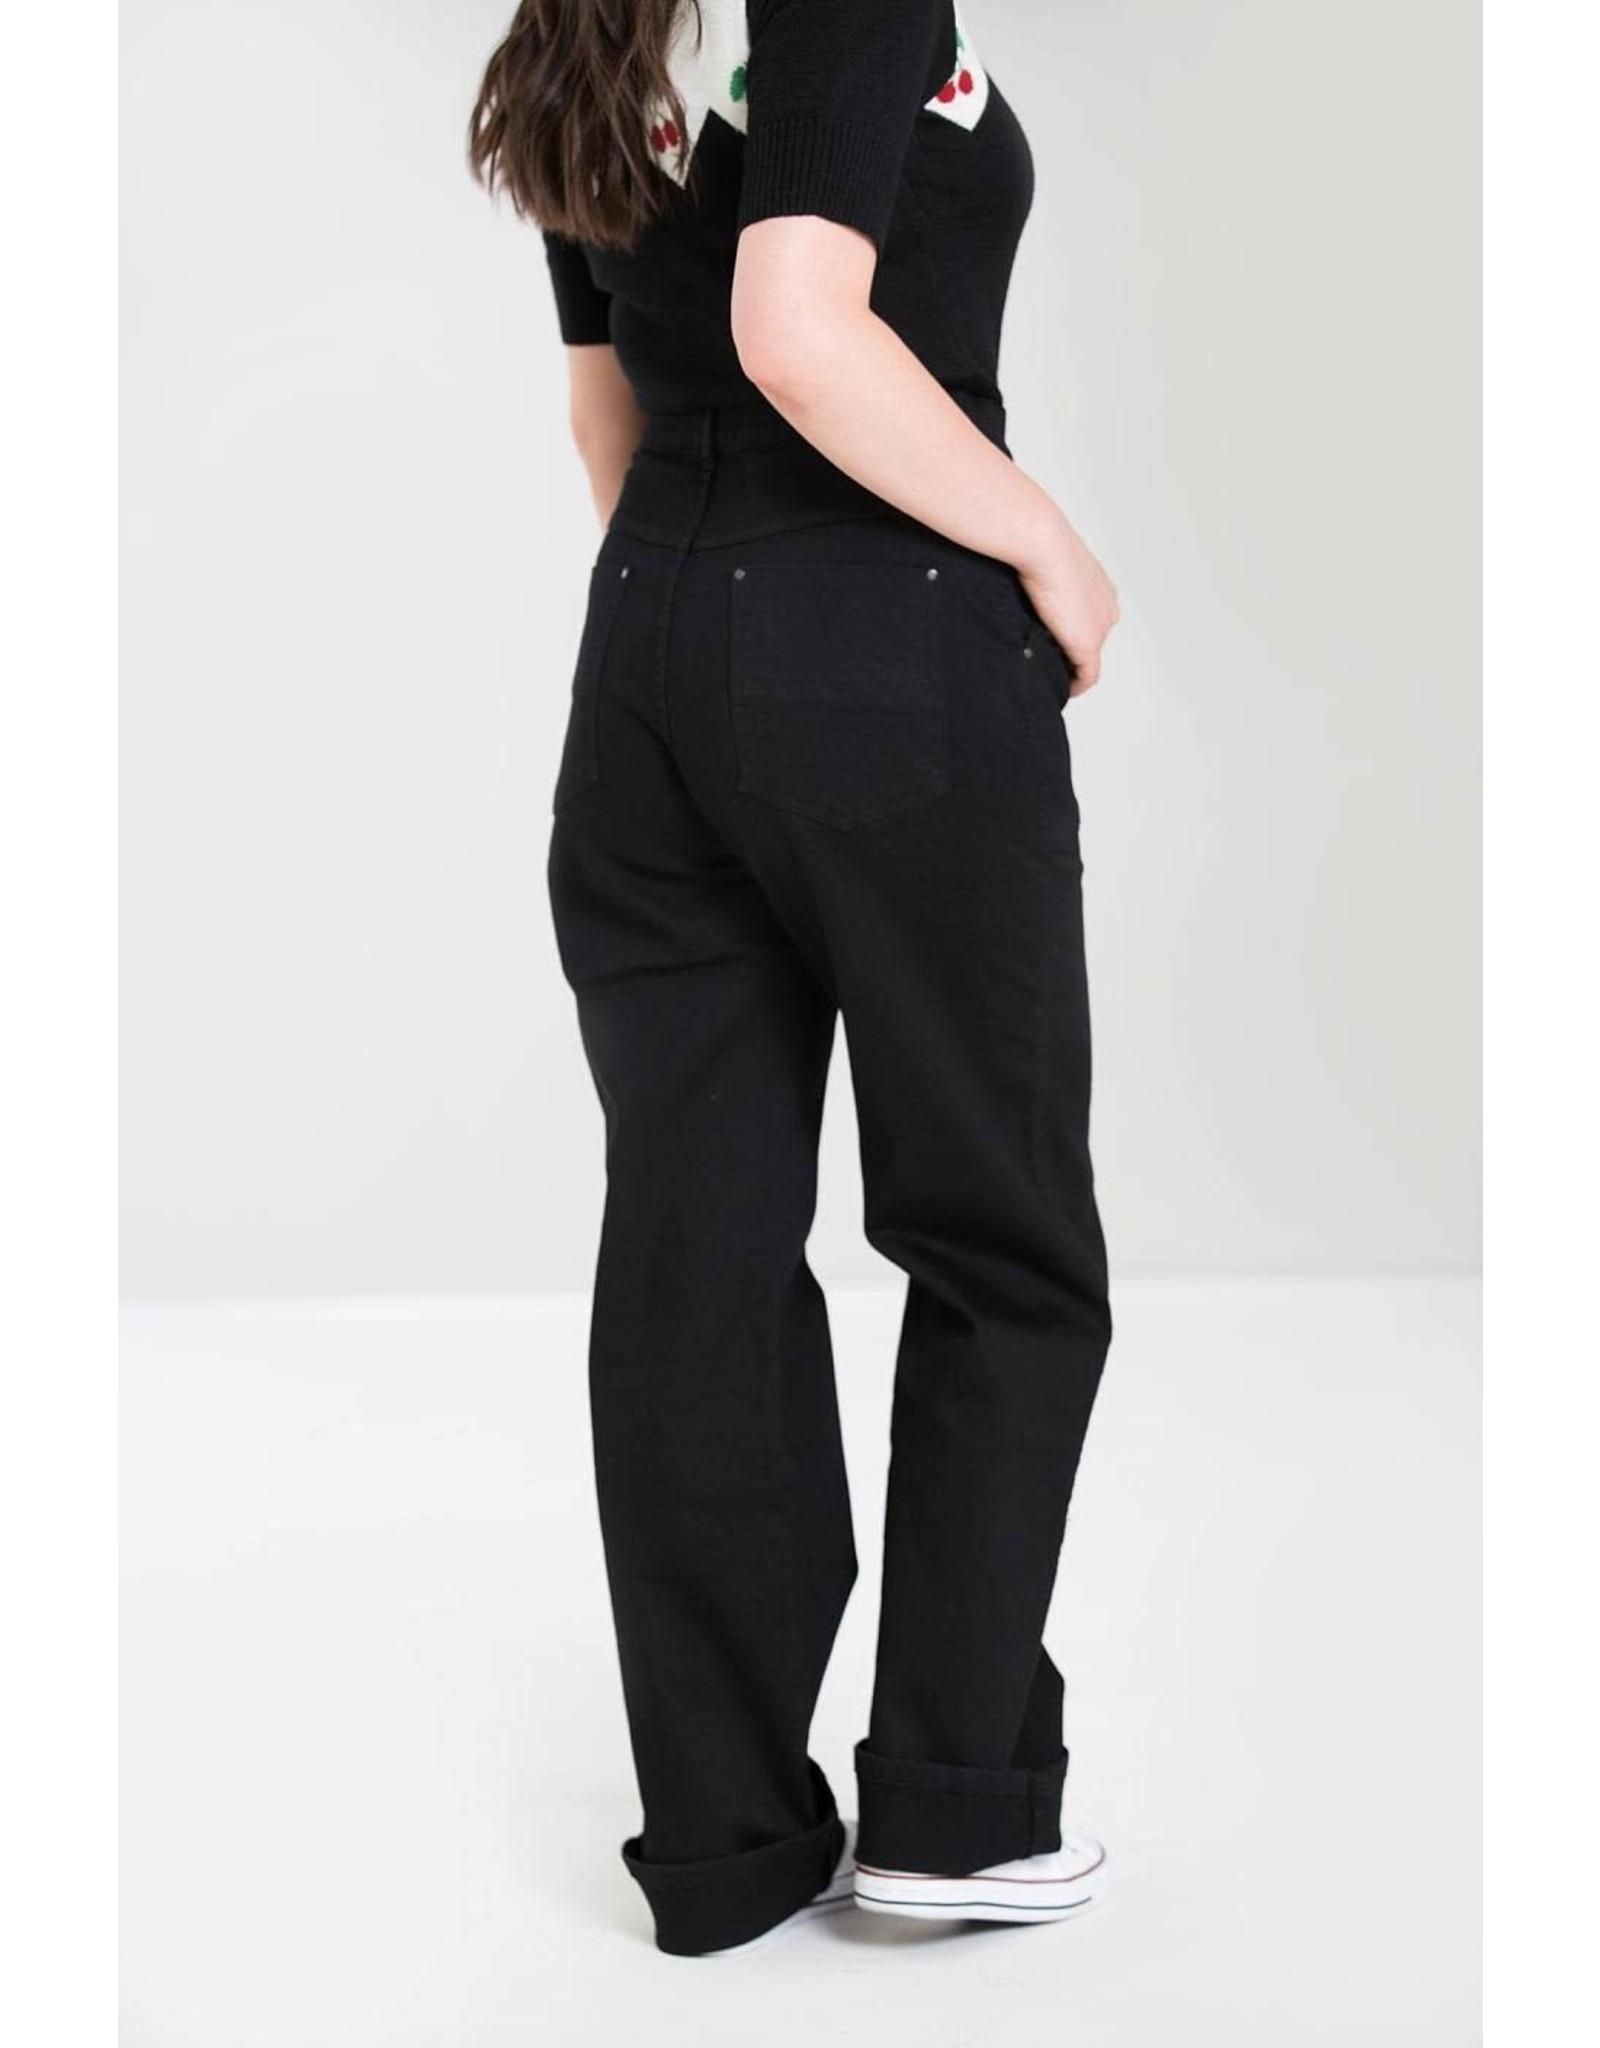 HELL BUNNY - Weston Denim Jeans